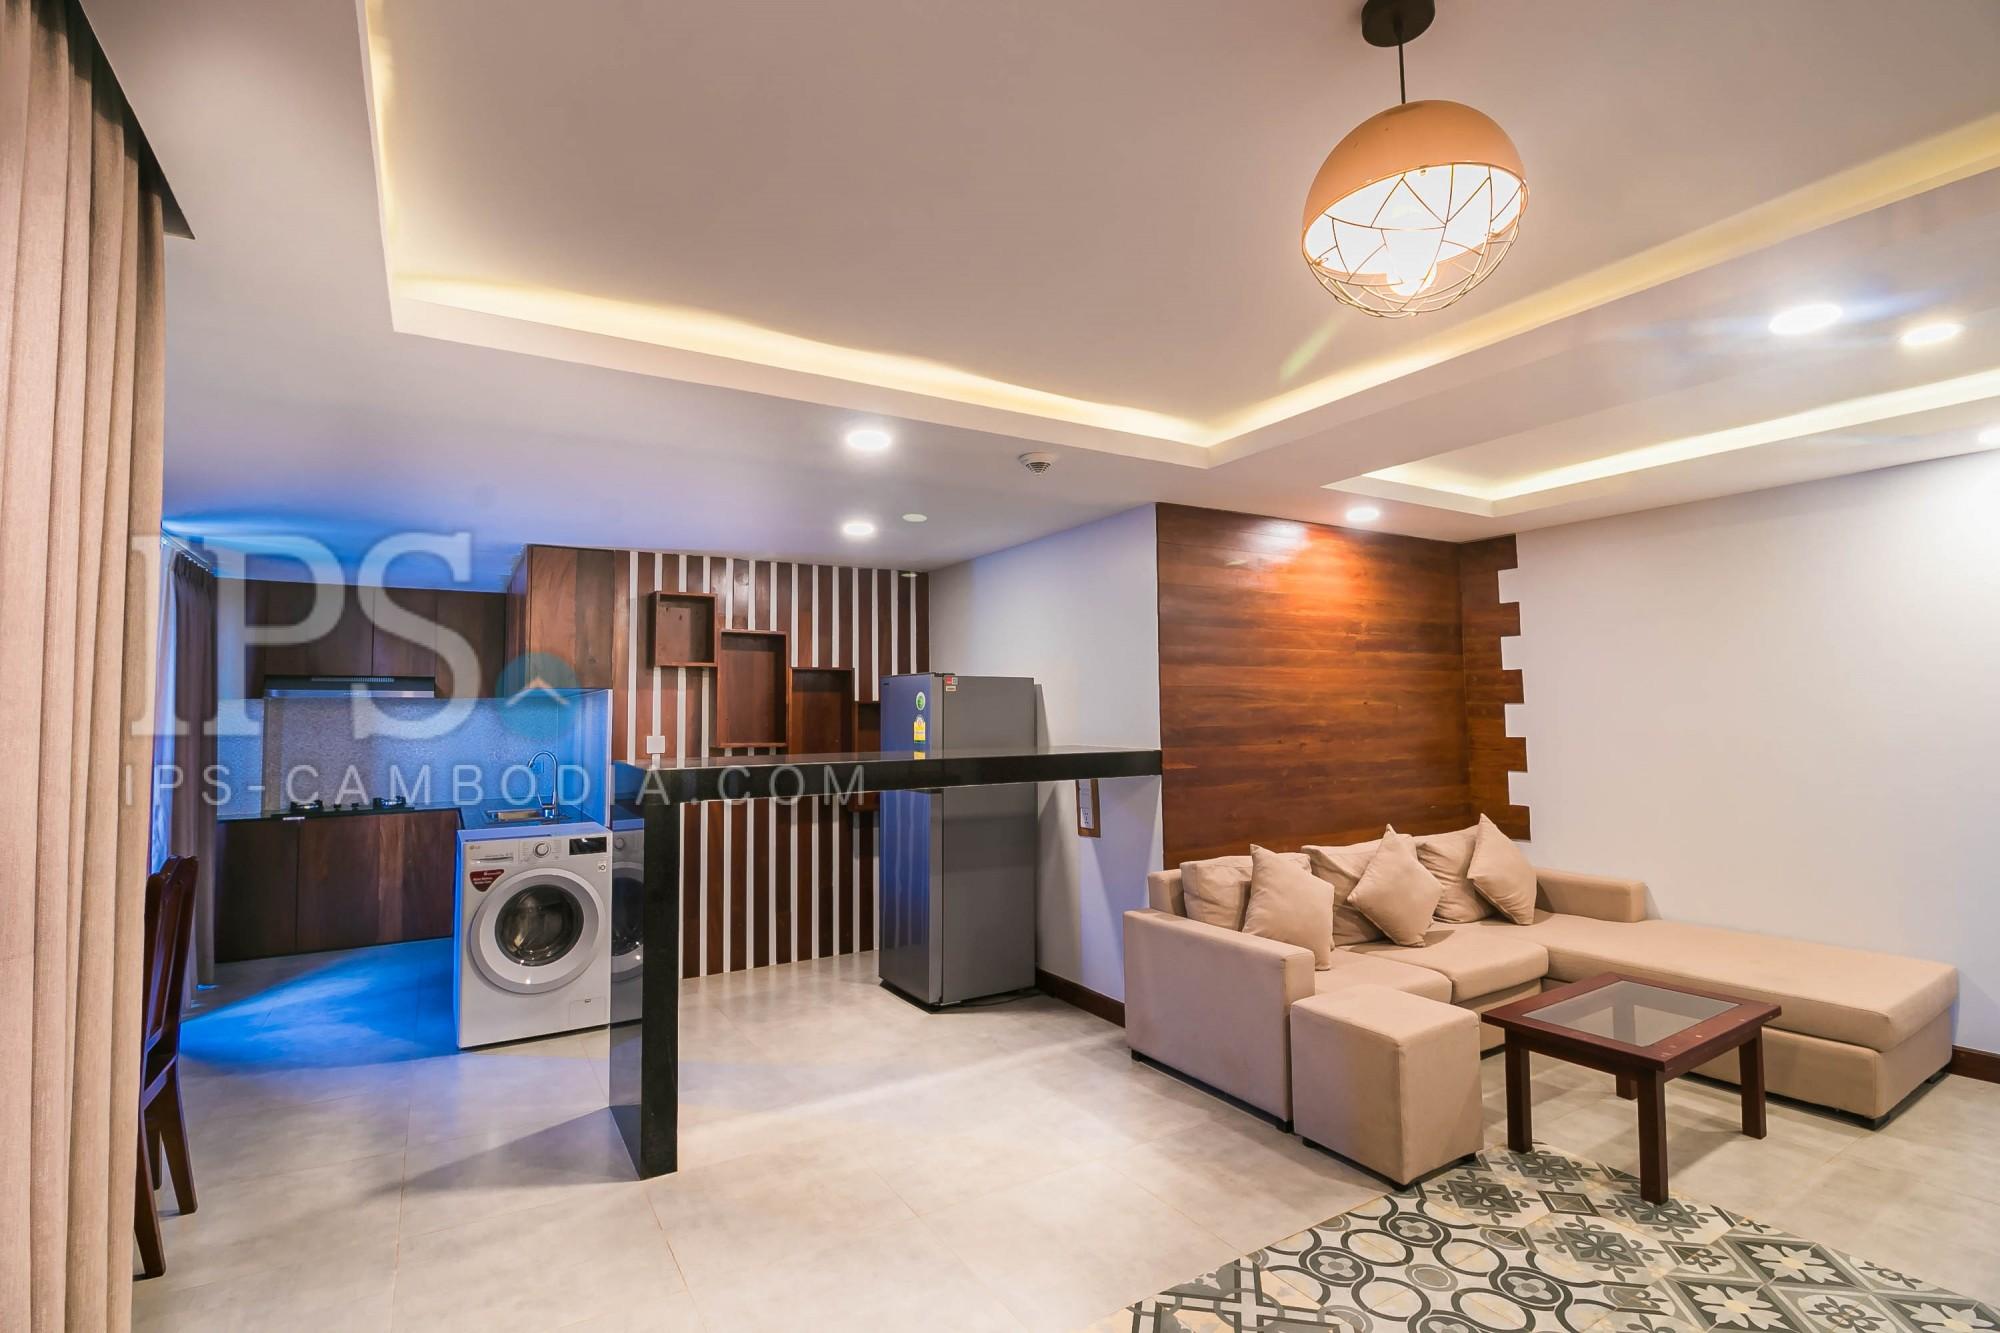 1 Bedroom Apartment For Rent - Old Market  Pub Street, Siem Reap